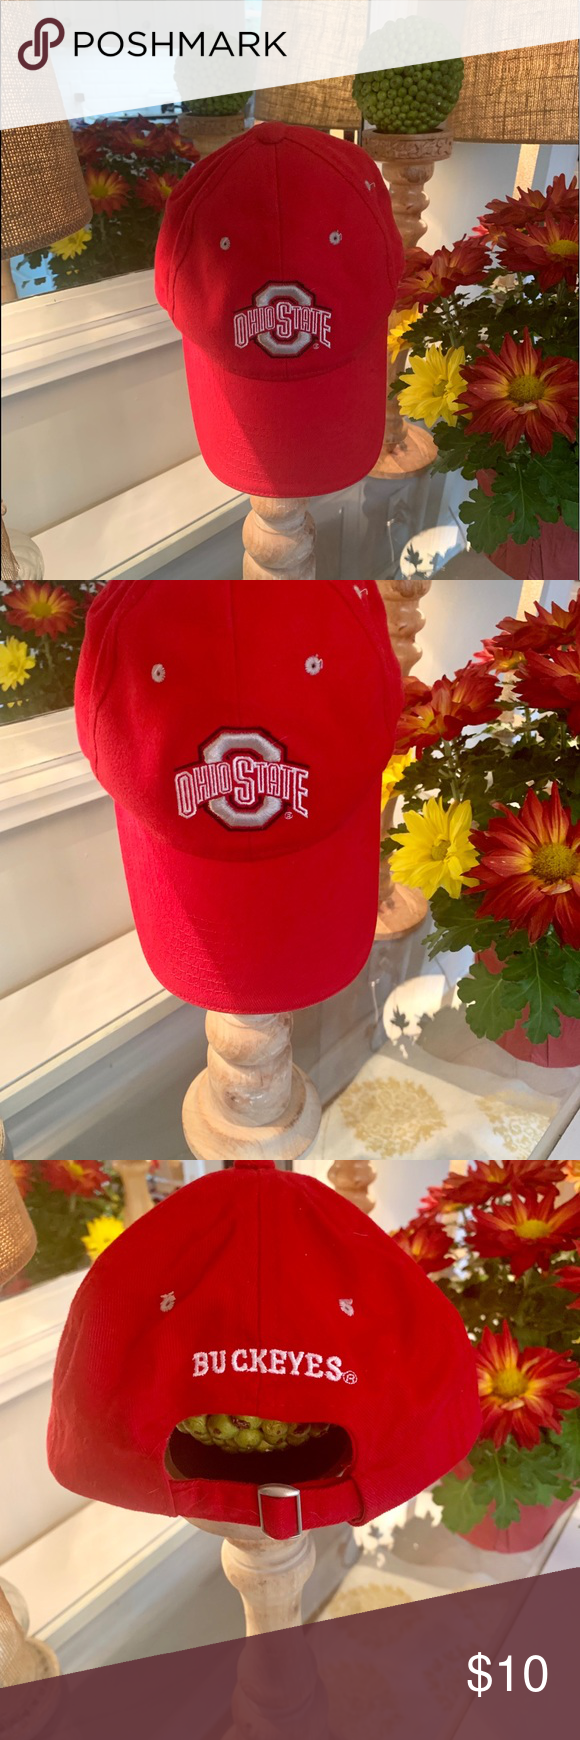 Ohio State Buckeyes red hat! ️ Ohio State Buckeyes red hat! ️ #ohiostatebuckeyes Ohio State Buckeyes red hat! ️ Ohio State Buckeyes red hat! ️